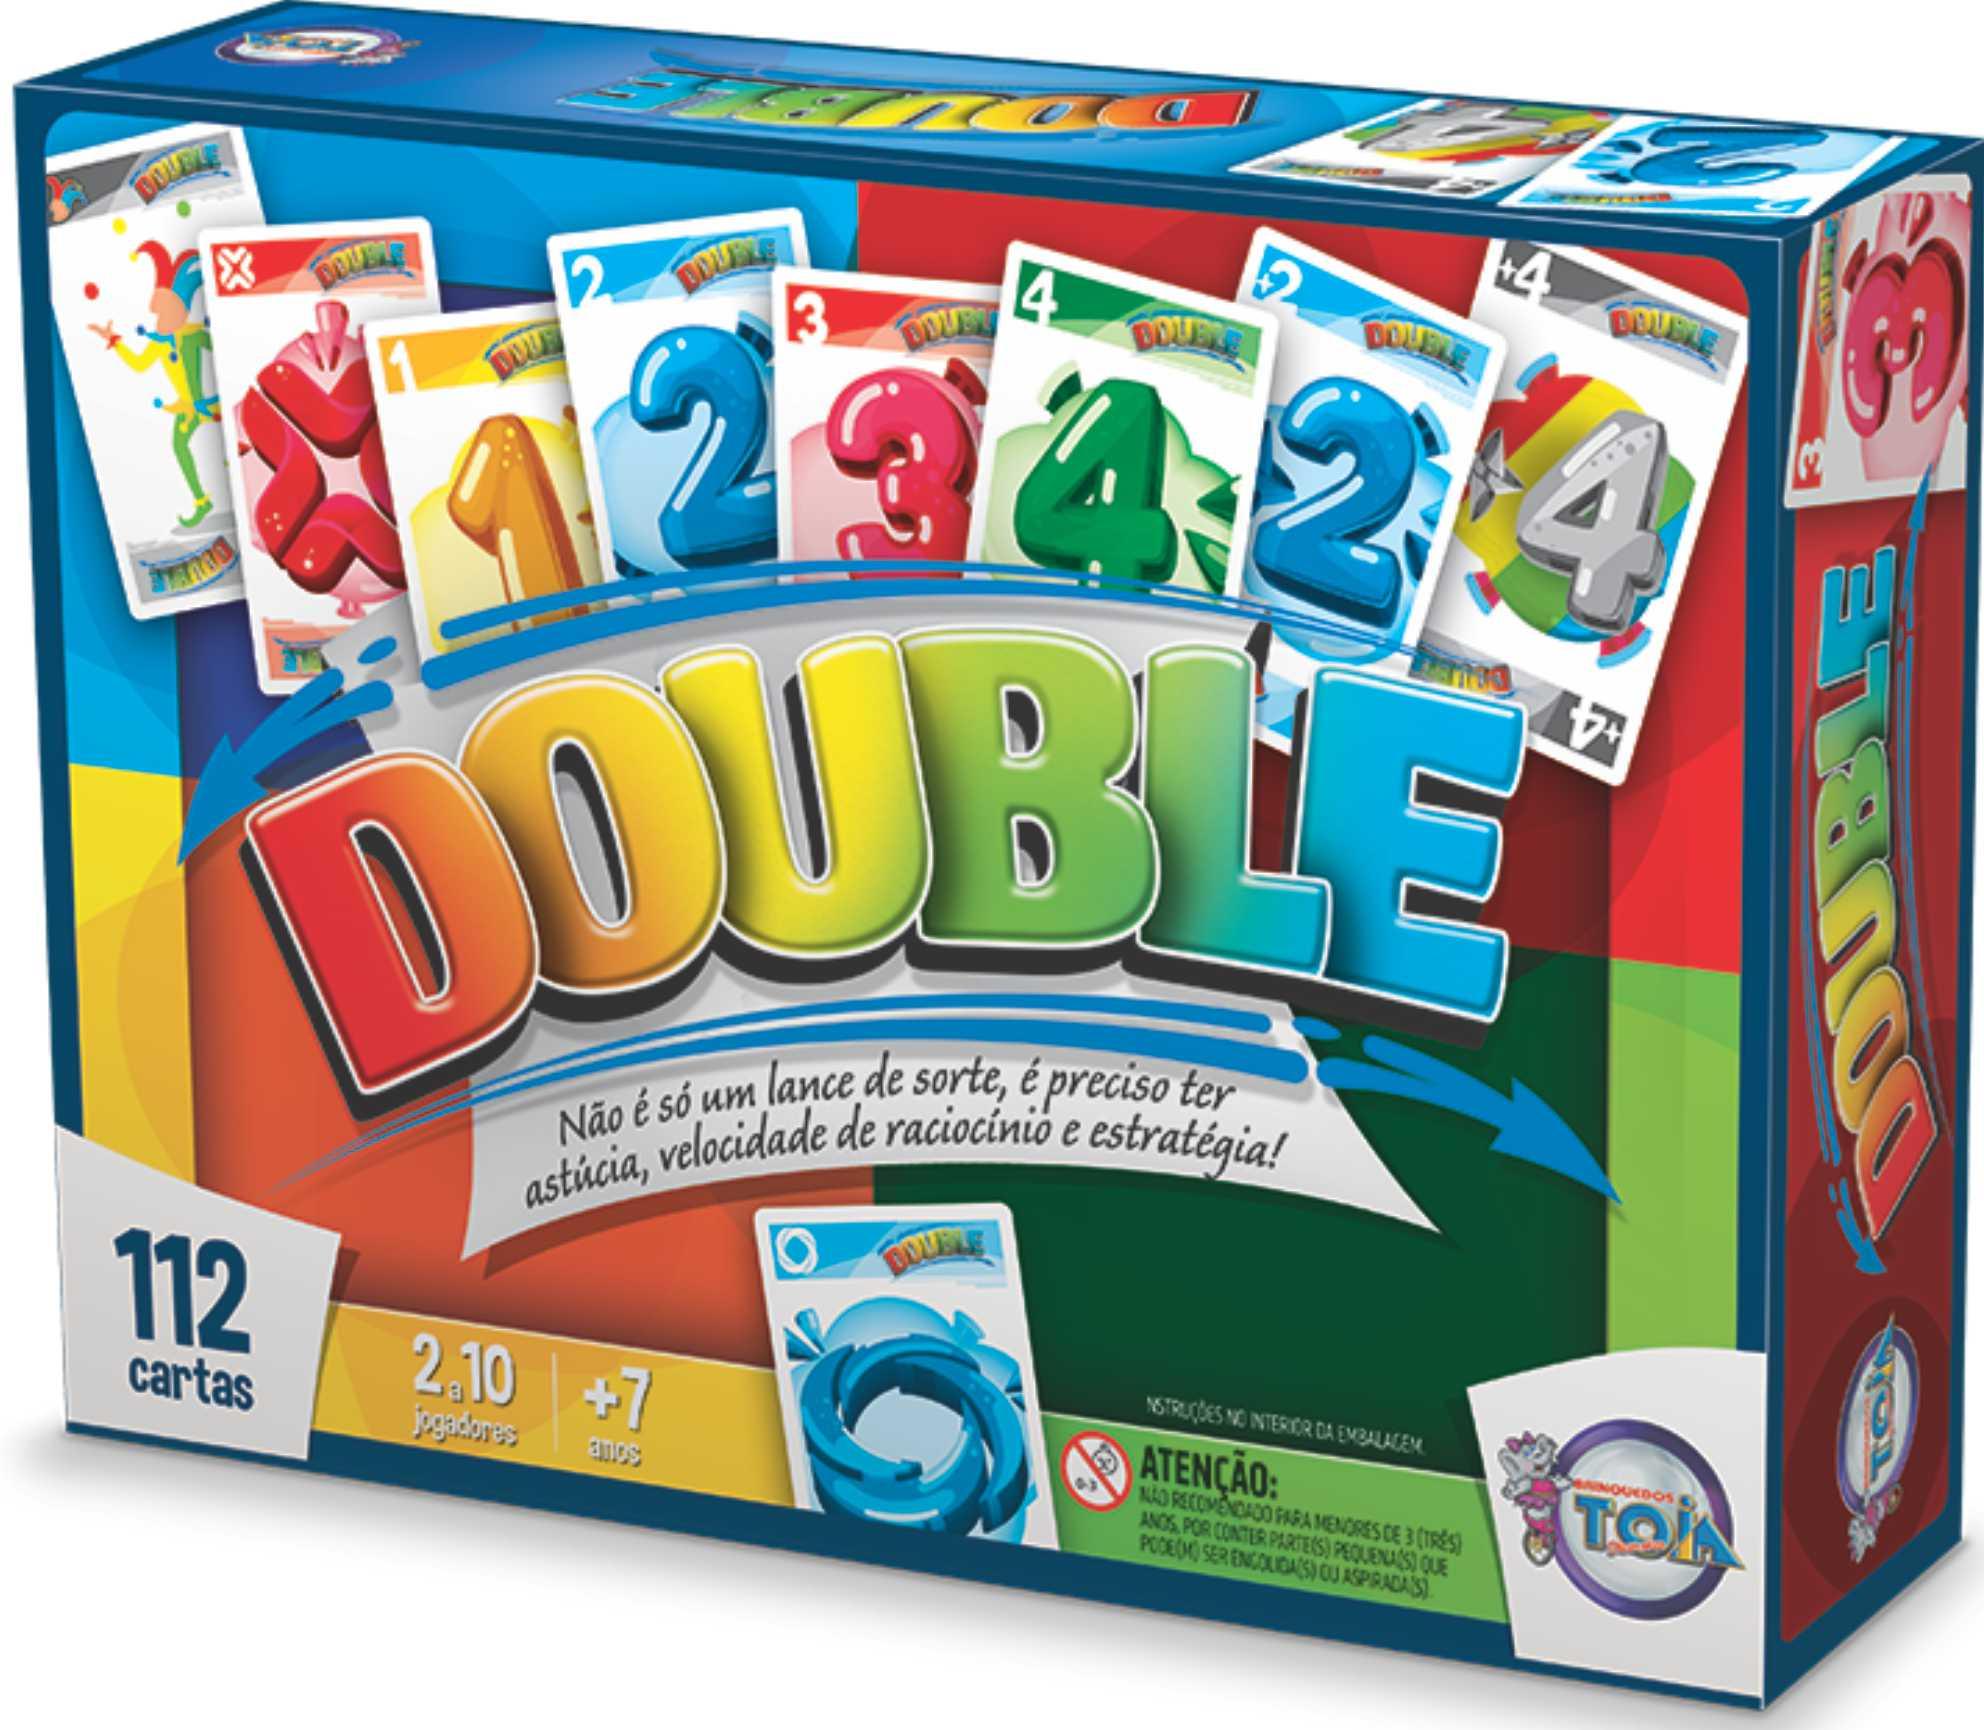 Double - Idade 7 anos - Embalagem: 28 x 20 x 6cm